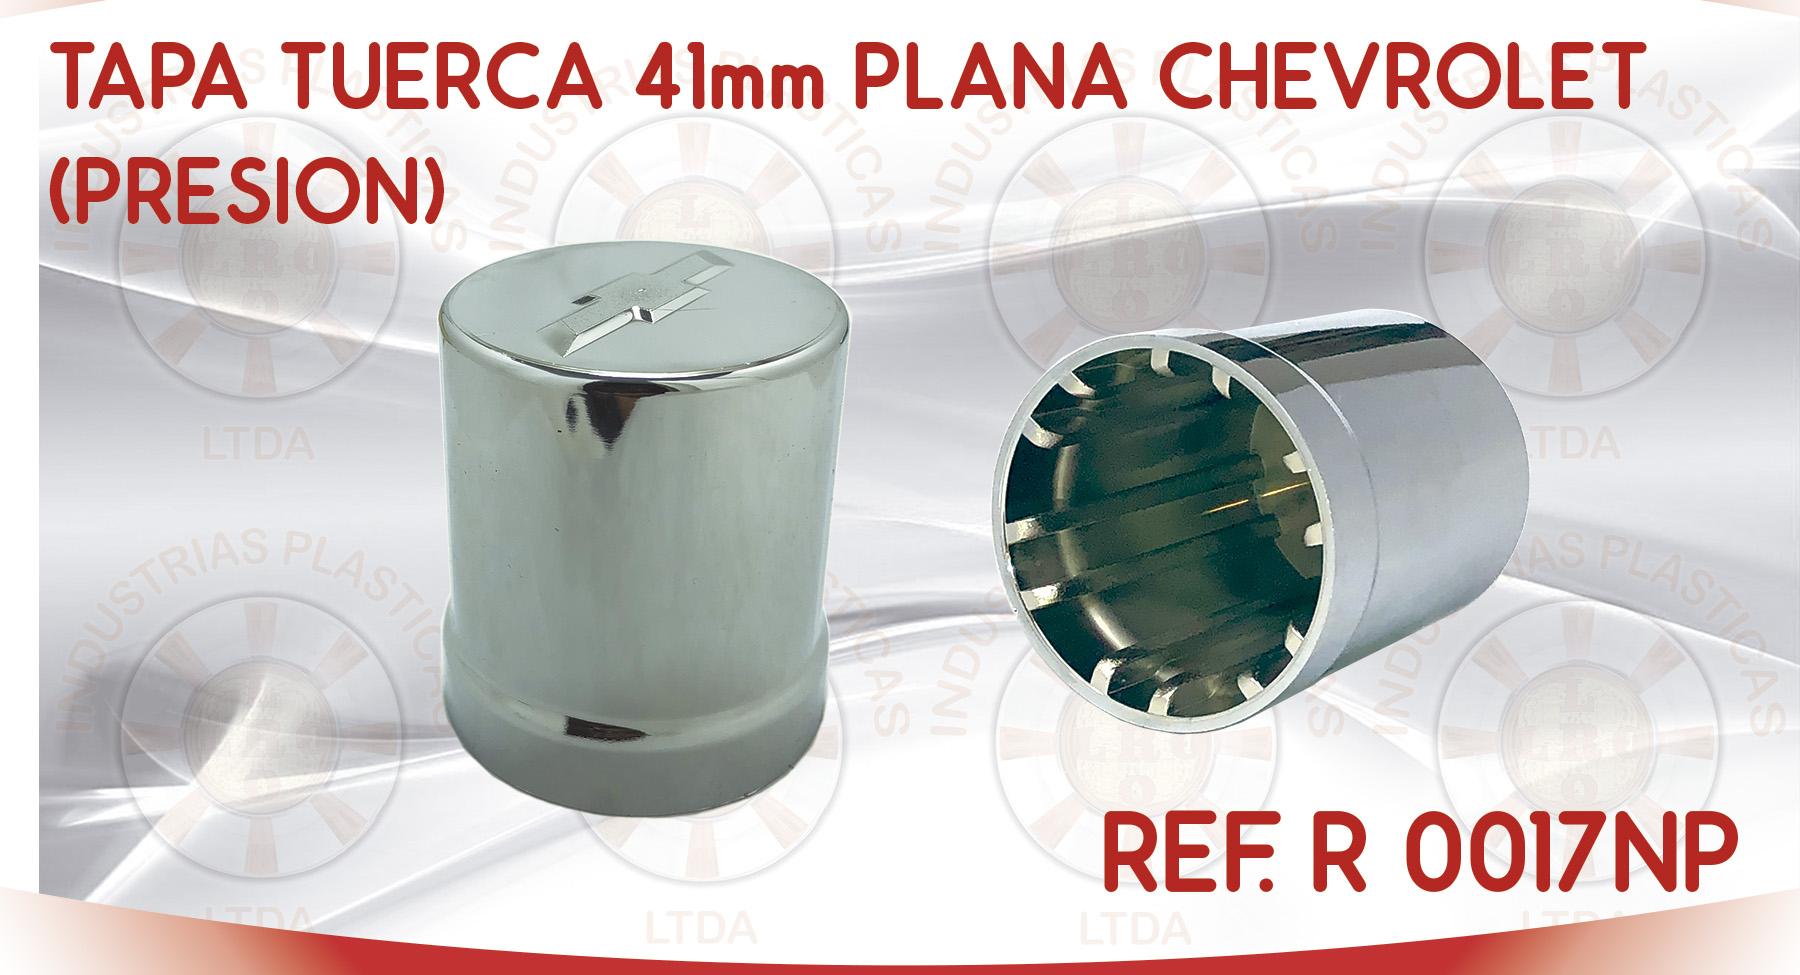 R 0017NP TAPA TUERCA 41mm PLANA CHEVROLET PRESION